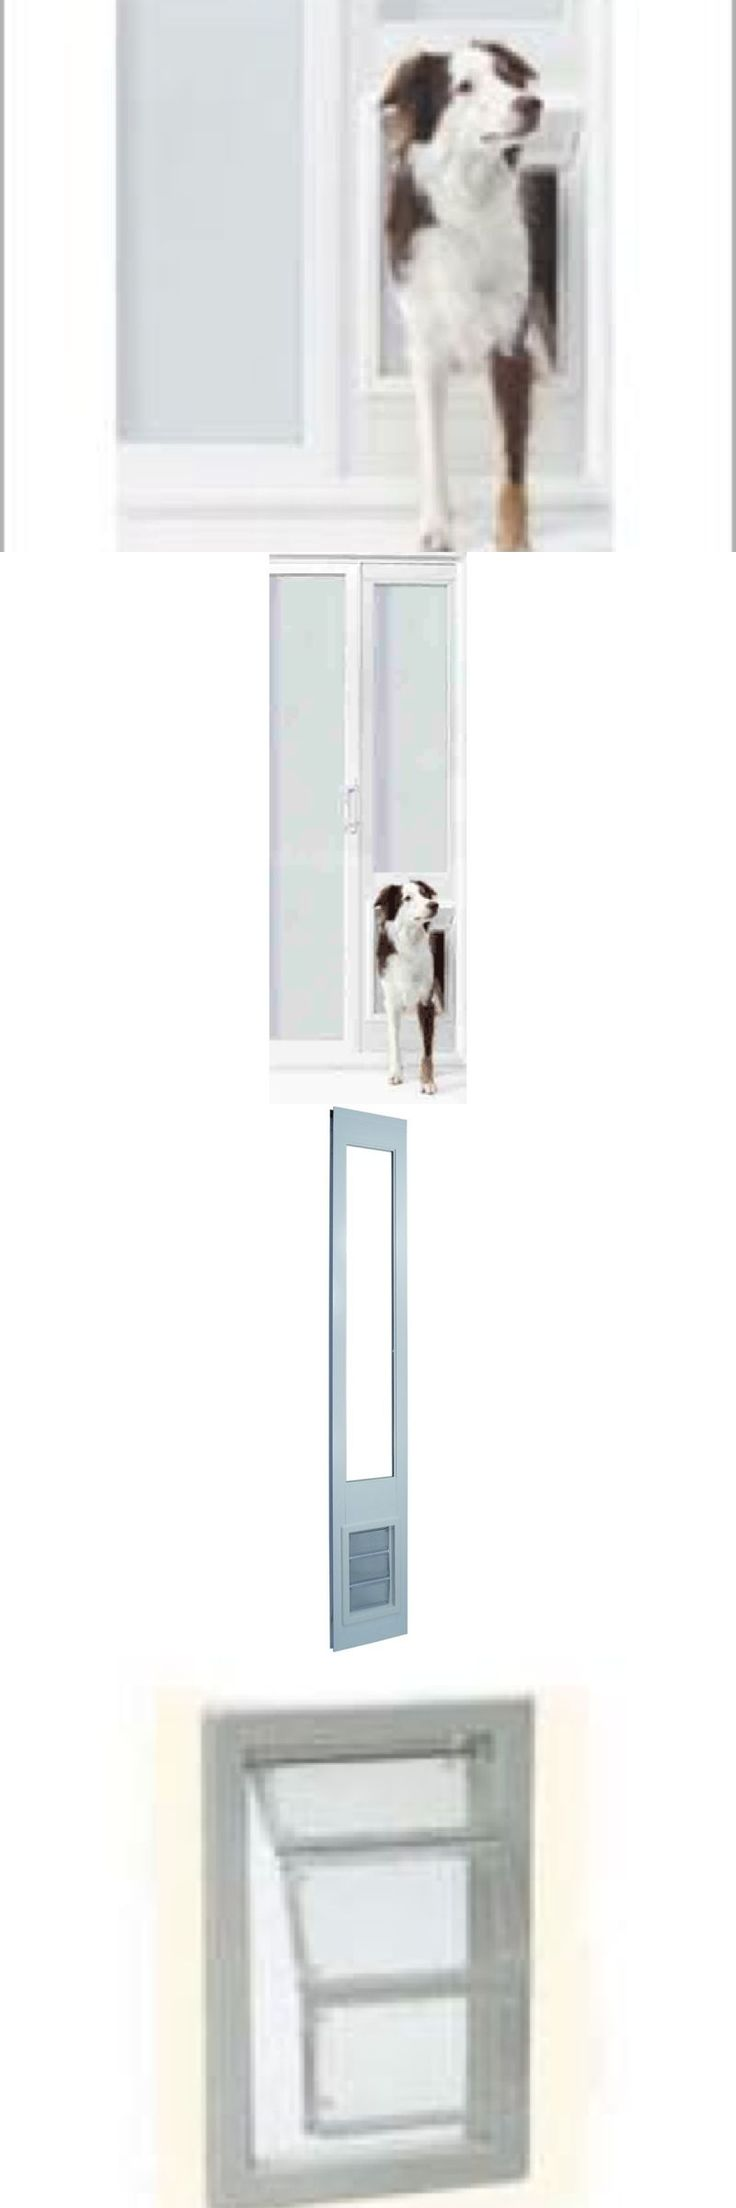 25 melhores ideias de sliding glass dog door no pinterest porta doors and flaps 116379 ideal model 78vip150xl 78 extra large dog door for vinyl eventelaan Image collections